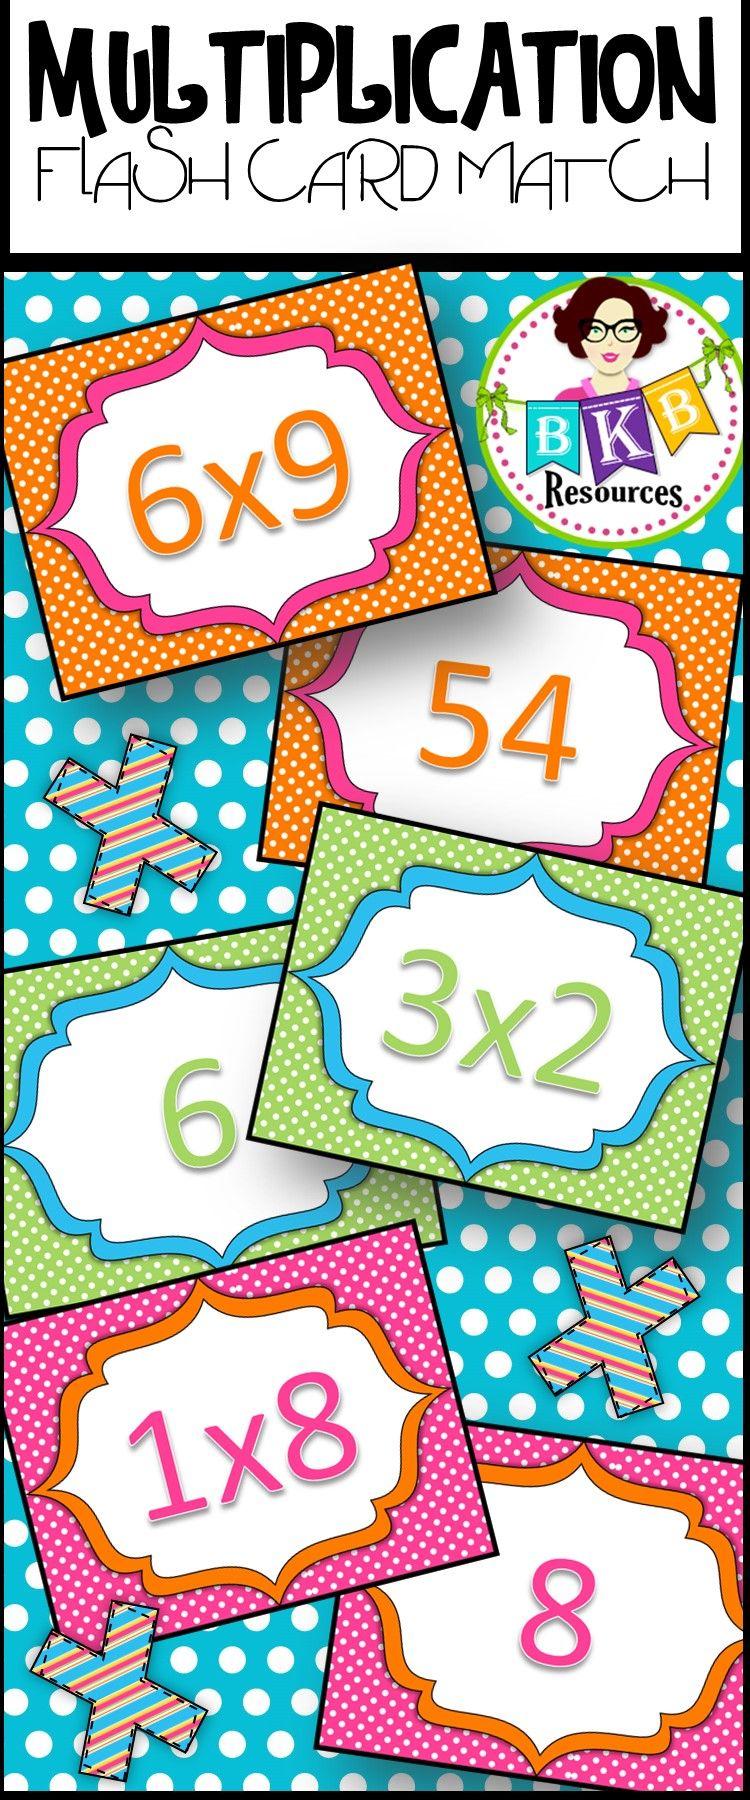 multiplication flash card match teaching math pinterest multiplication flash cards multiplication and equation